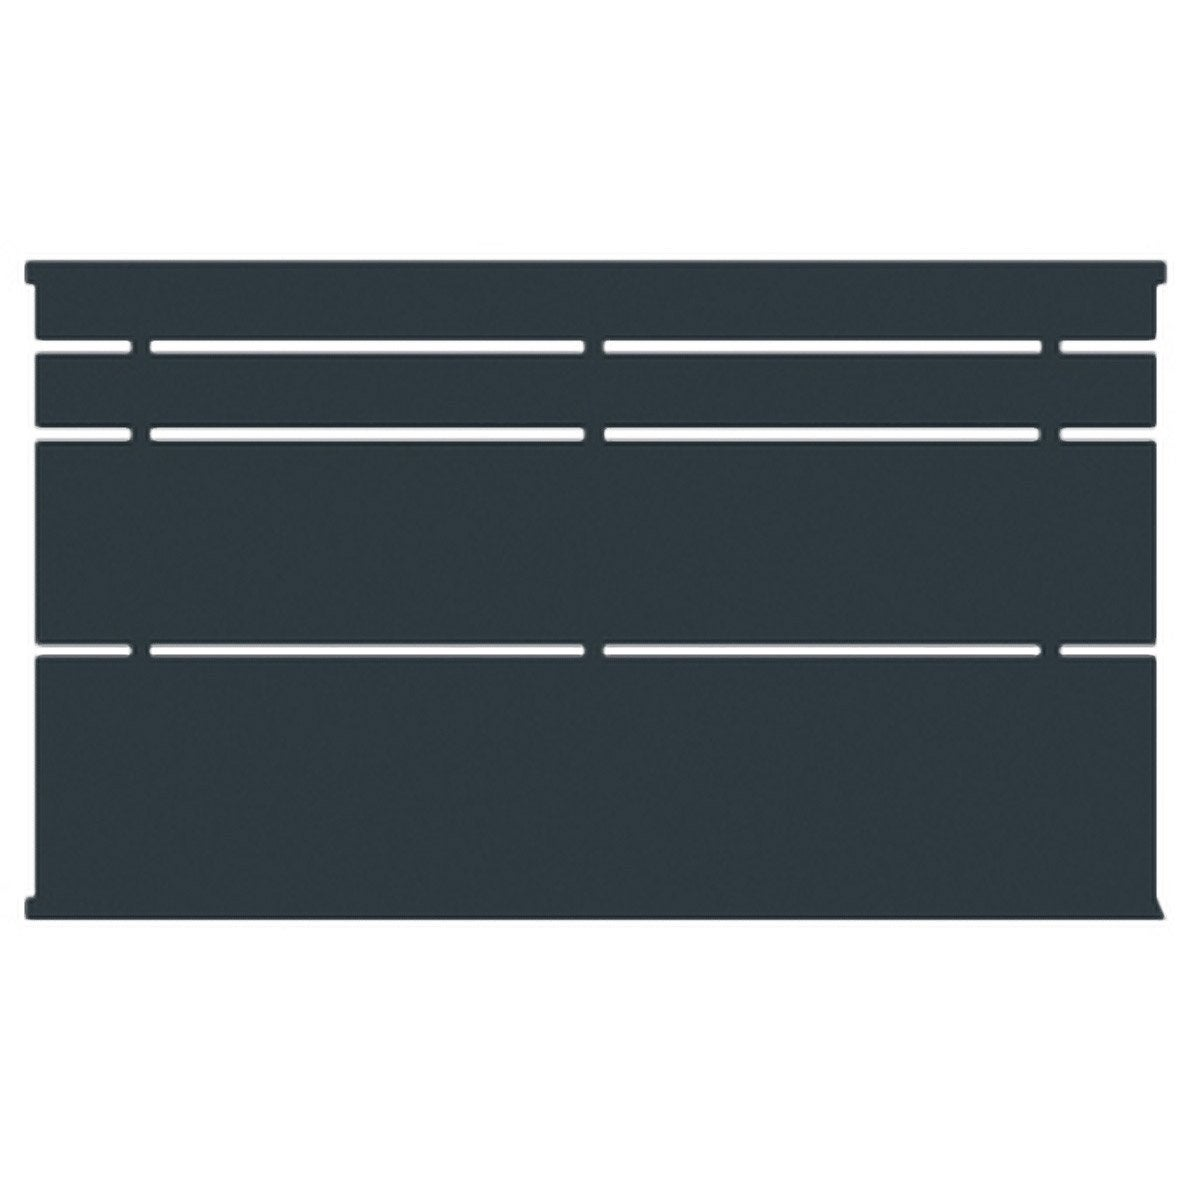 cl ture acier himalia appr t gris peindre x cm leroy merlin. Black Bedroom Furniture Sets. Home Design Ideas